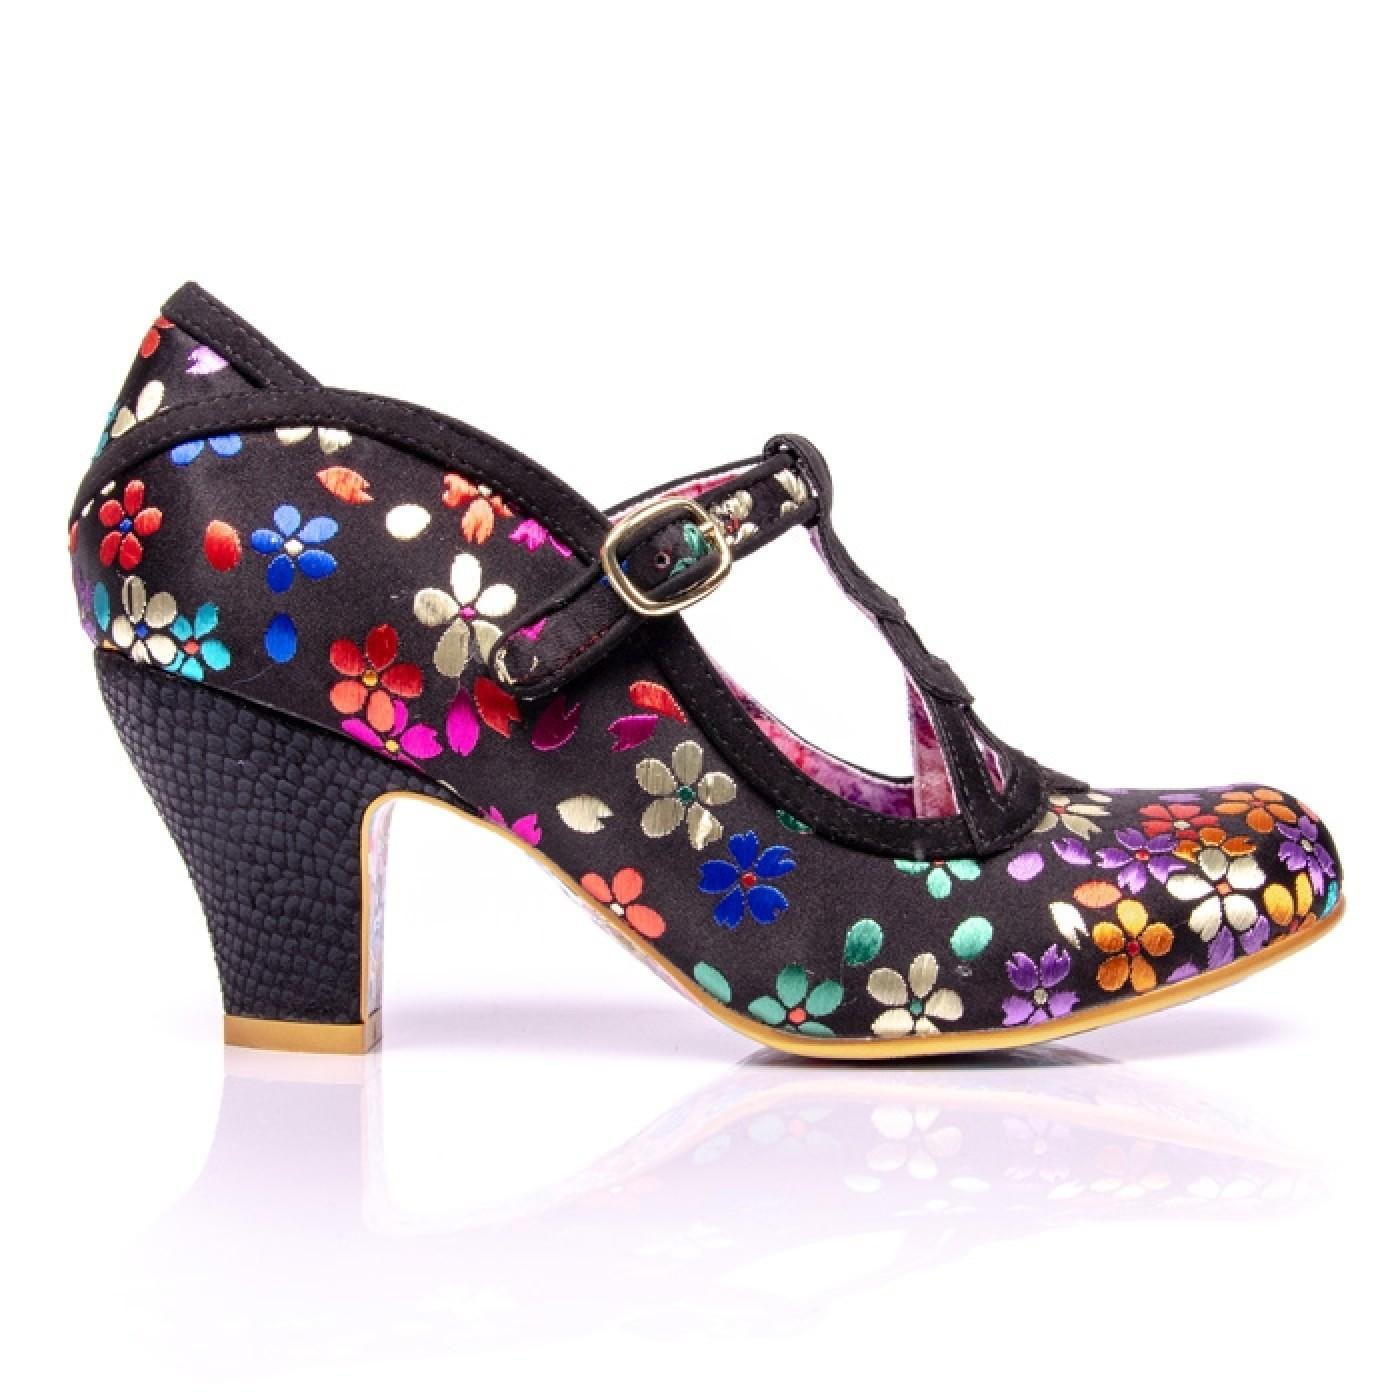 8b7f9e10989 IRREGULAR CHOICE Nicely Done Vintage Floral T-Bar Heels